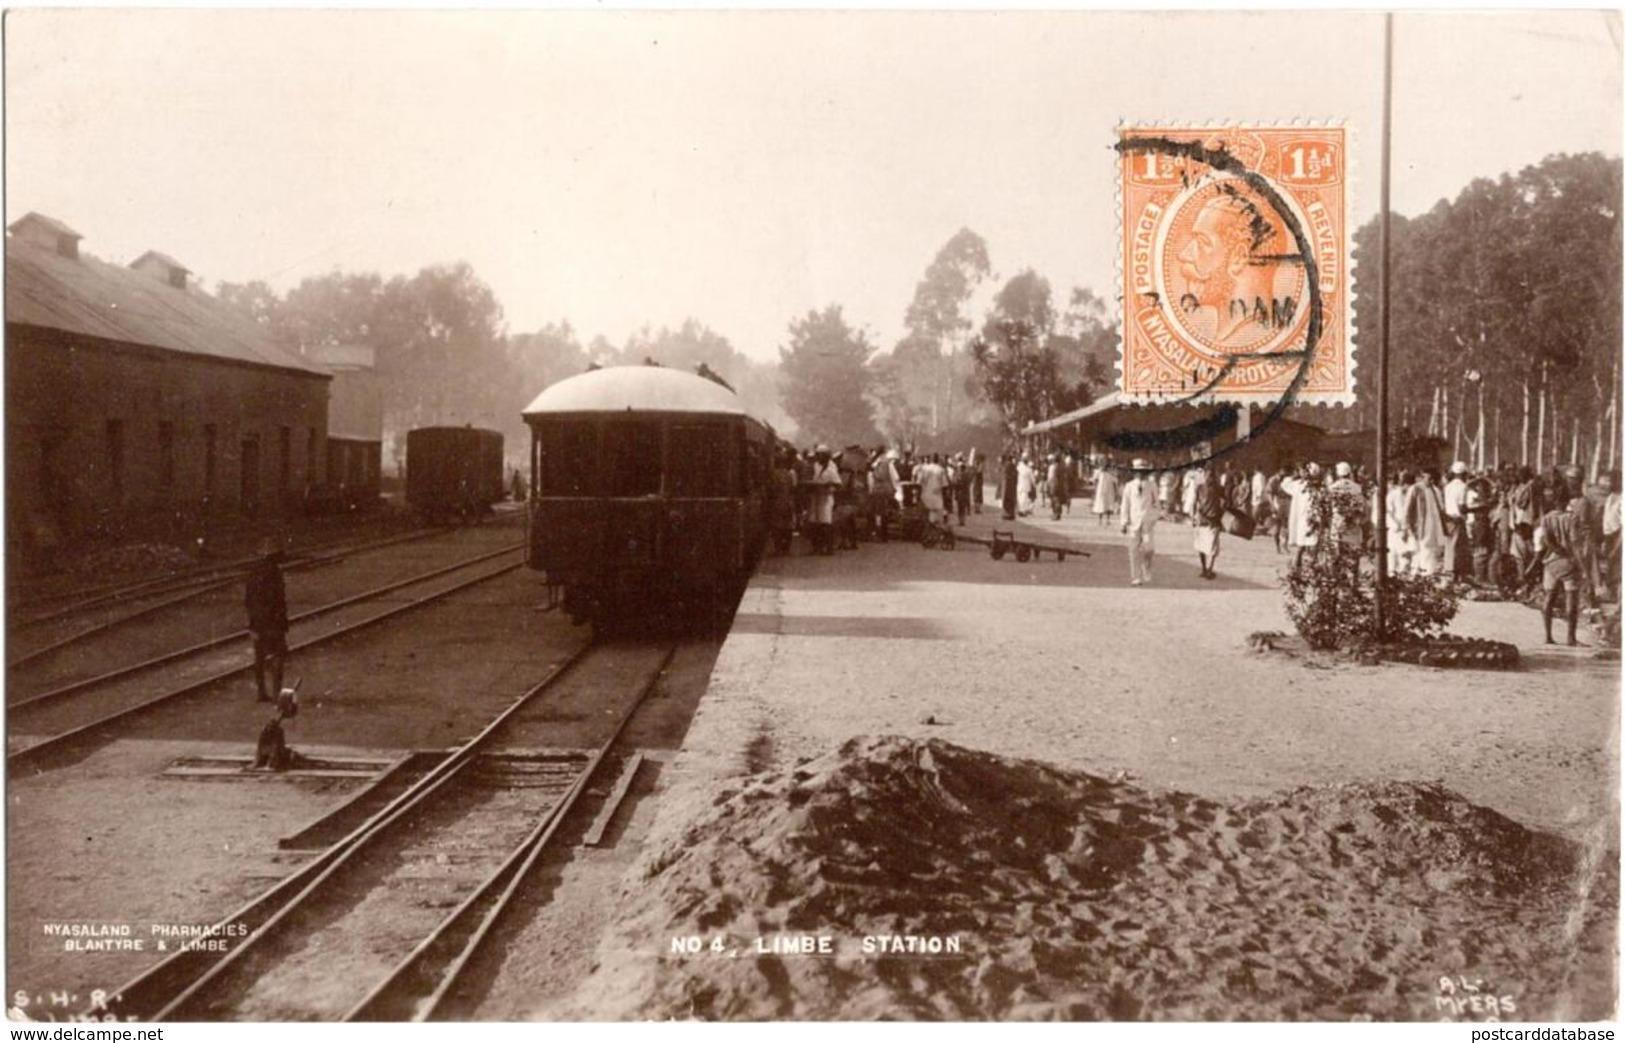 Limbe Station - Nyasaland - & Railway Station, Train - Malawi